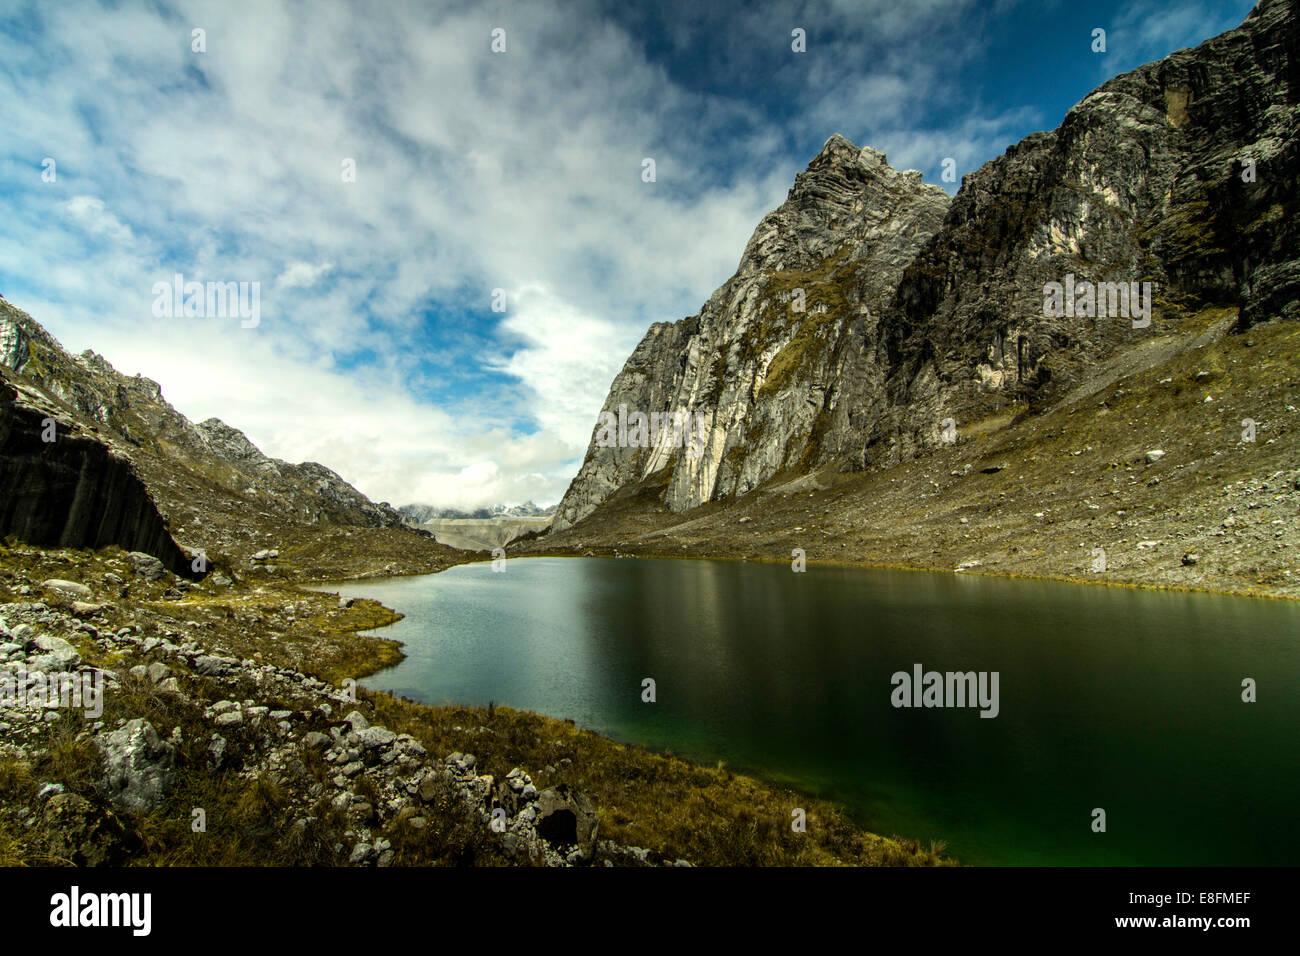 Indonesia, Papua, Jayawijaya, Lorents National Conservation Park, View of Meren East Lake - Stock Image